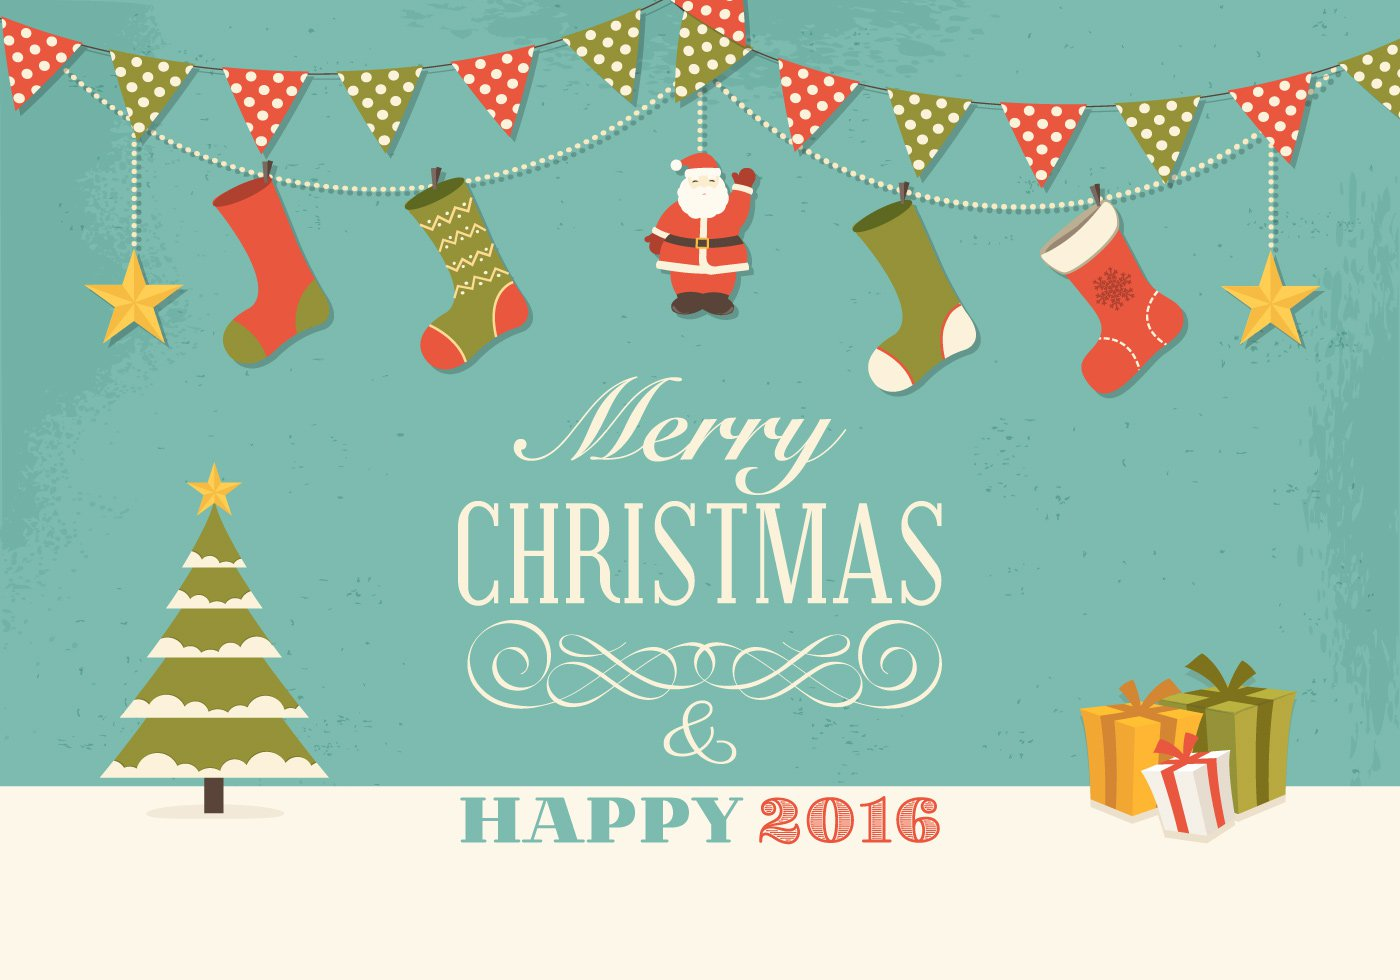 1400x980 Xmas Freebies 25 Best Hi Quality Christmas Graphic Vectors 2015